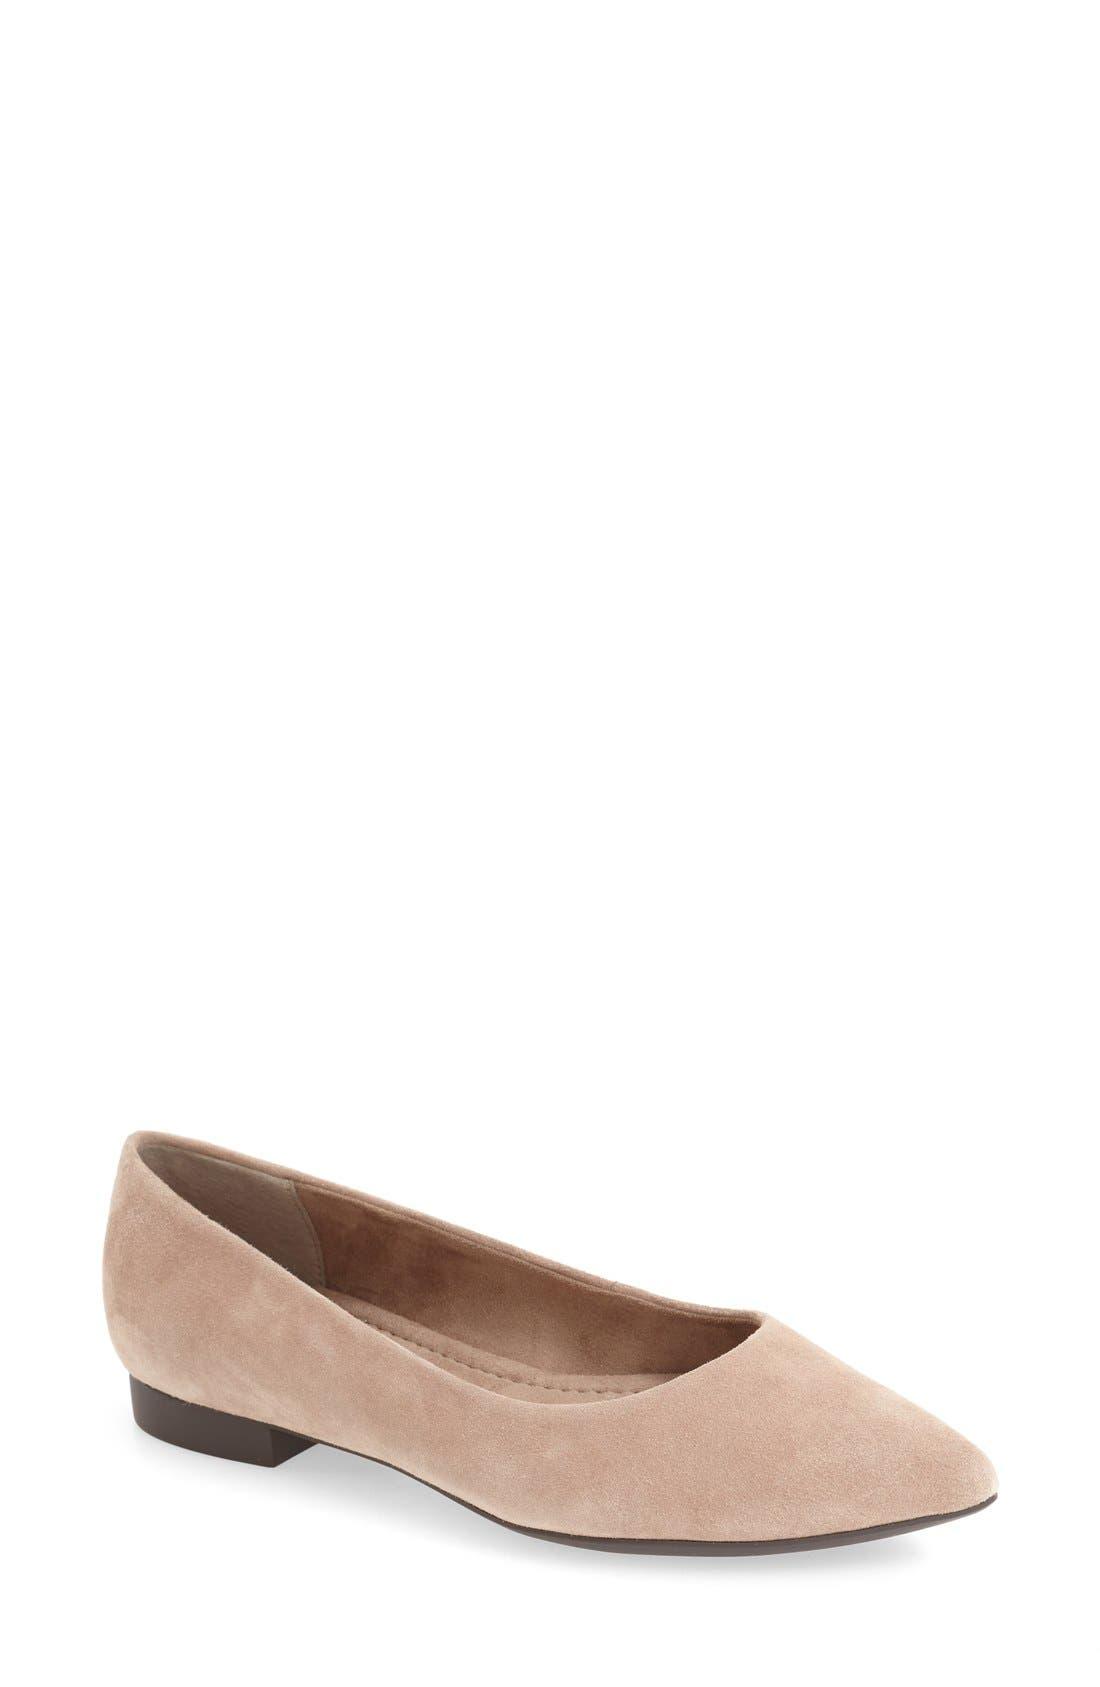 Main Image - Bella Vita 'Vivien' Pointy Toe Flat (Women)